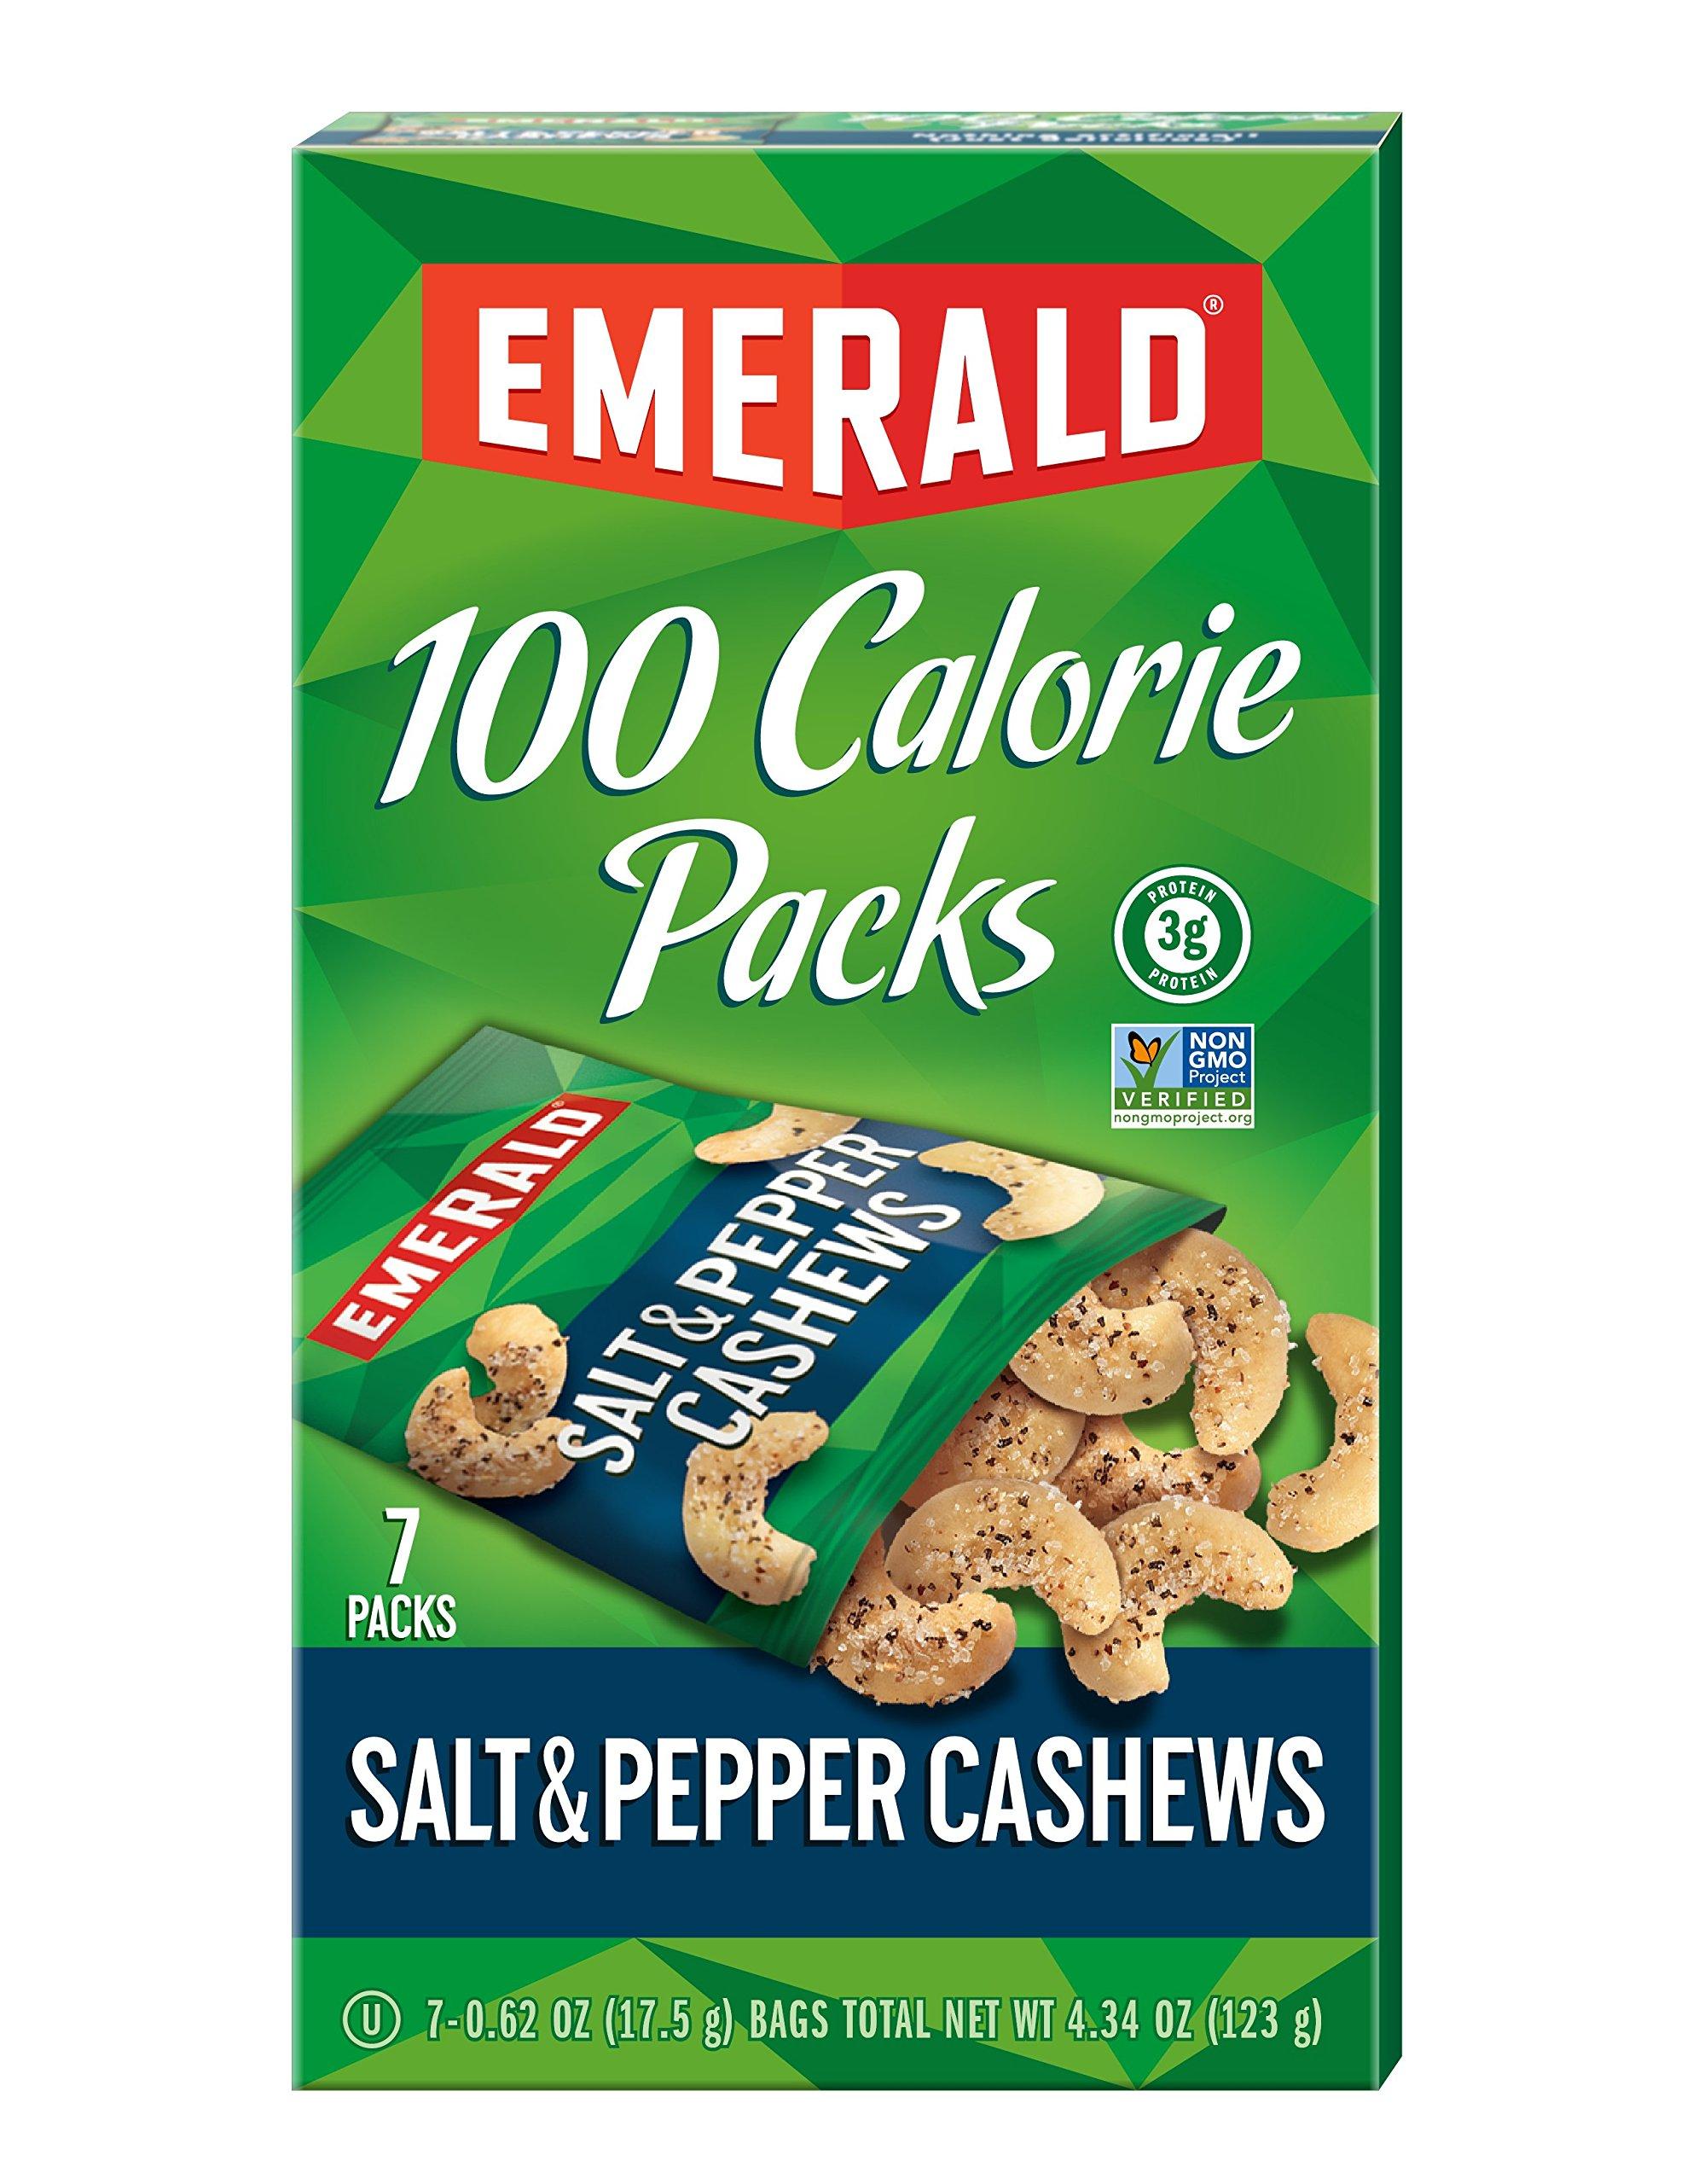 Emerald Salt and Pepper Cashews 100 Calorie Packs, 7-Count Box